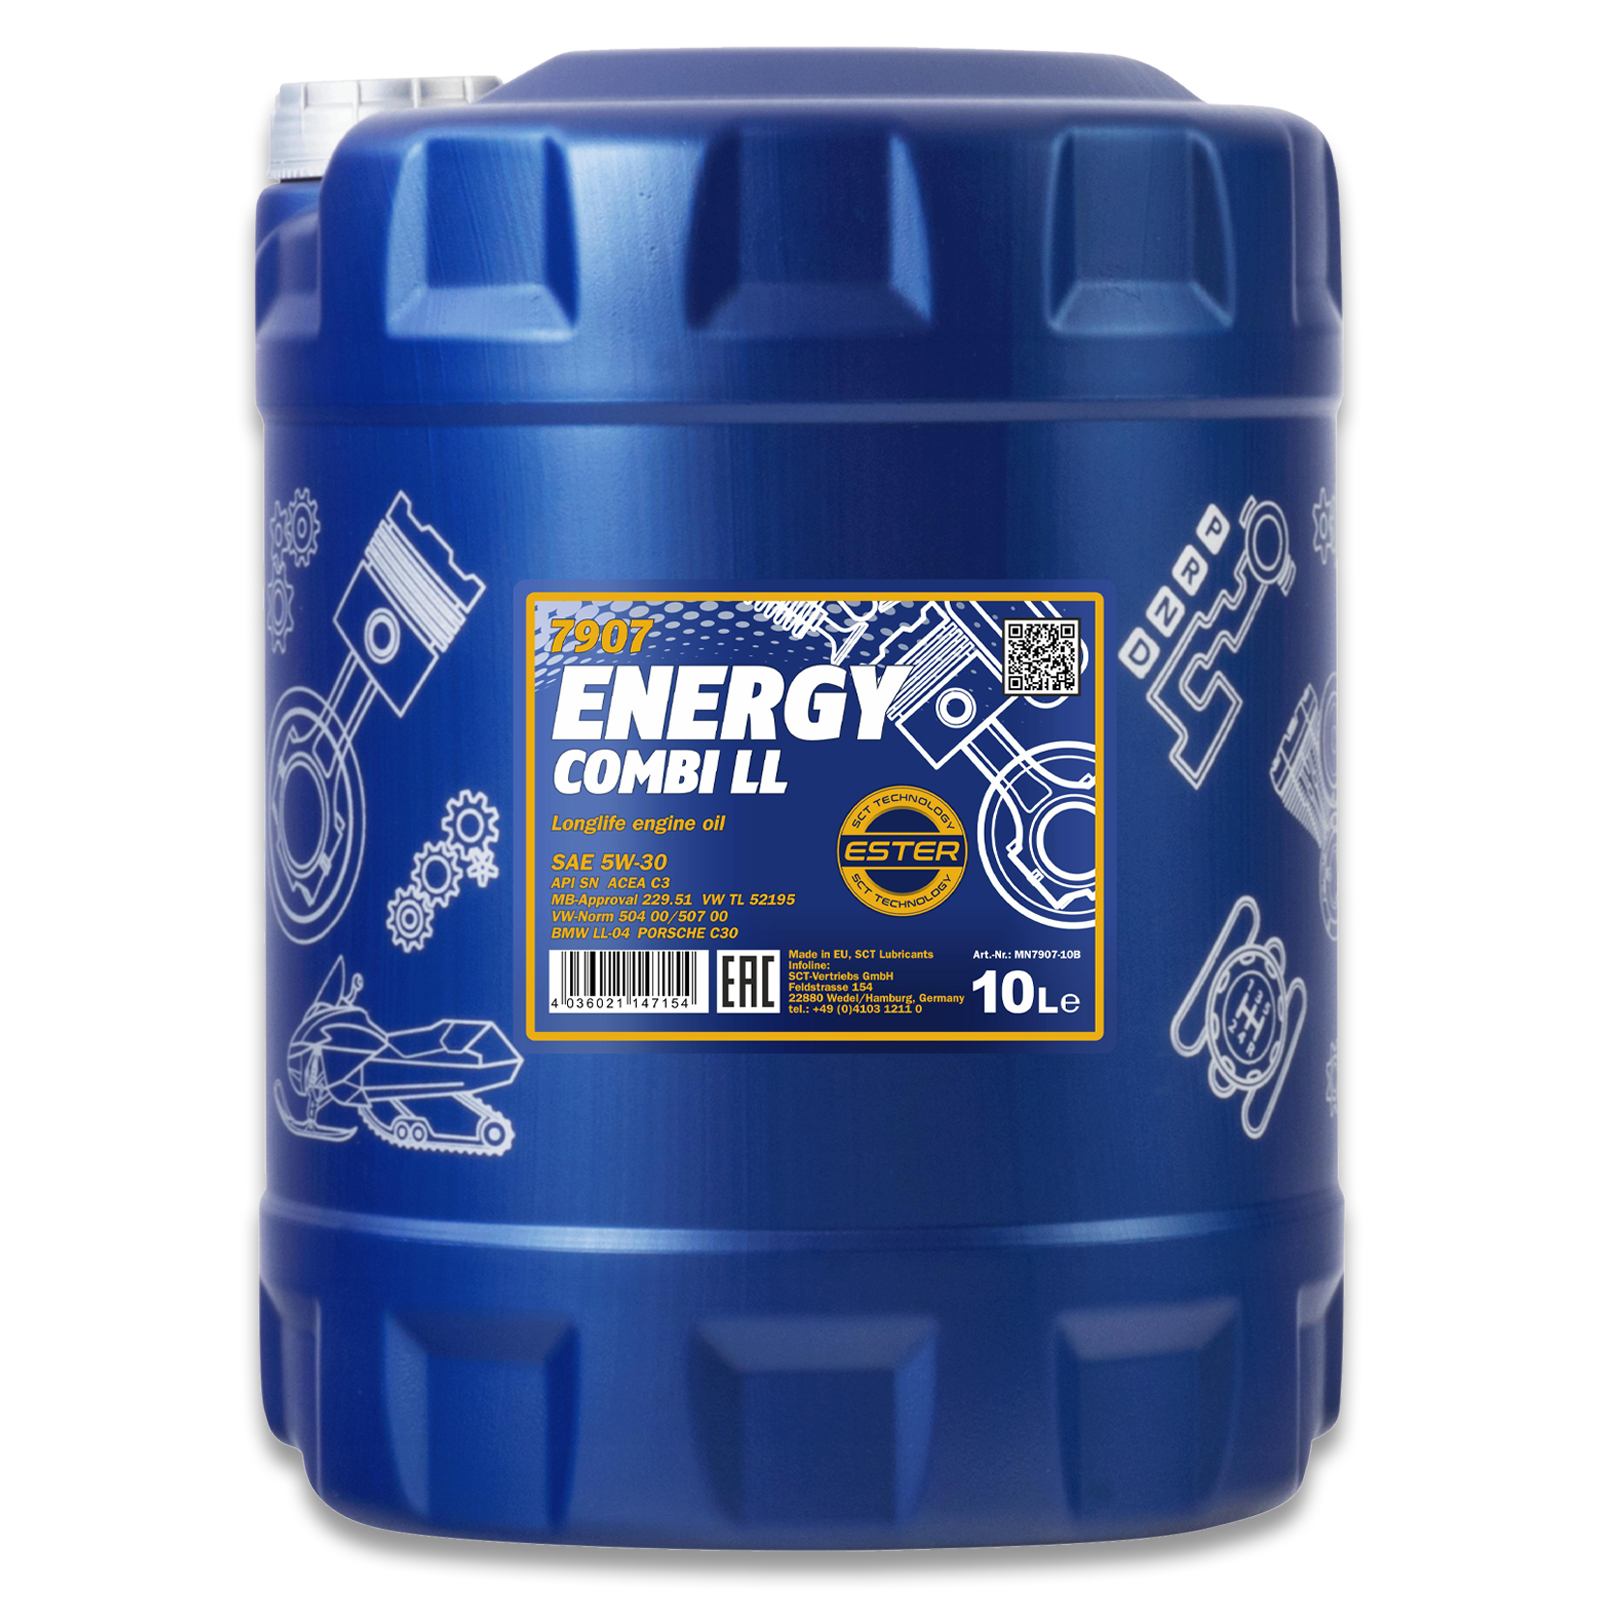 Mannol Motoröl Energy Combi LL 5W-30 10L